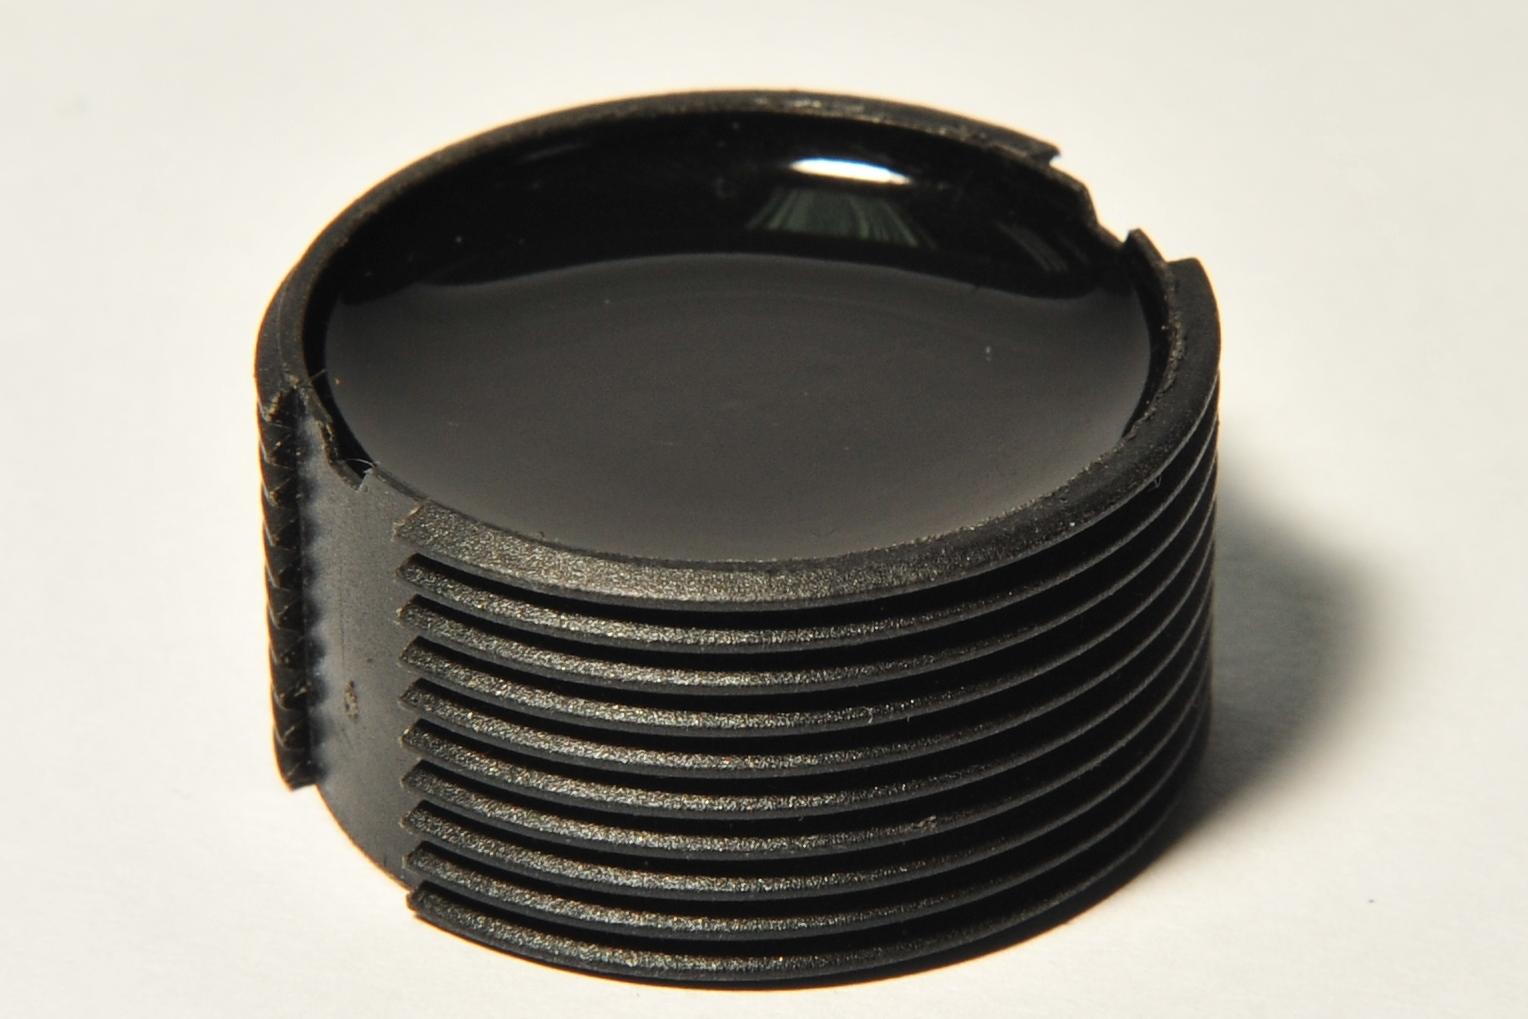 Two Component Polyurethane Adhesive